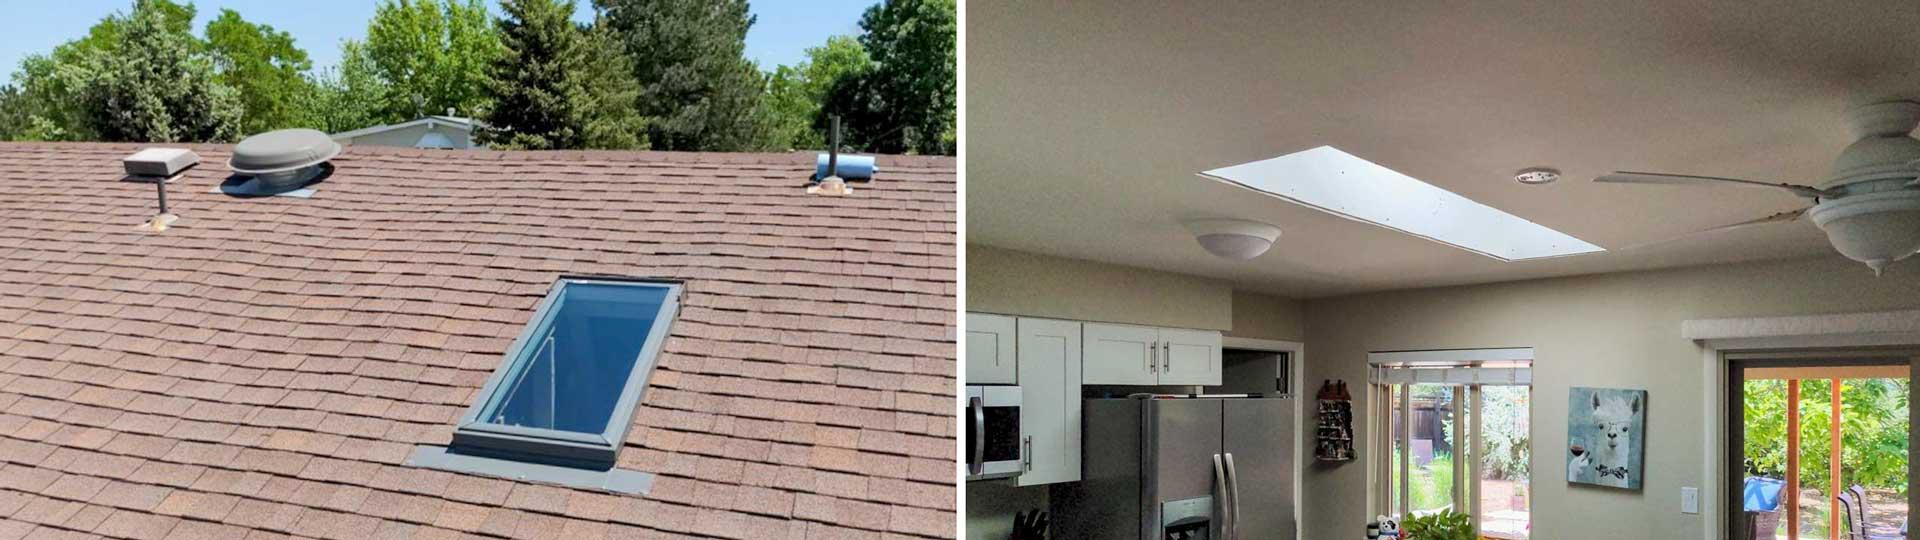 new install Velux FS C06 skylight header